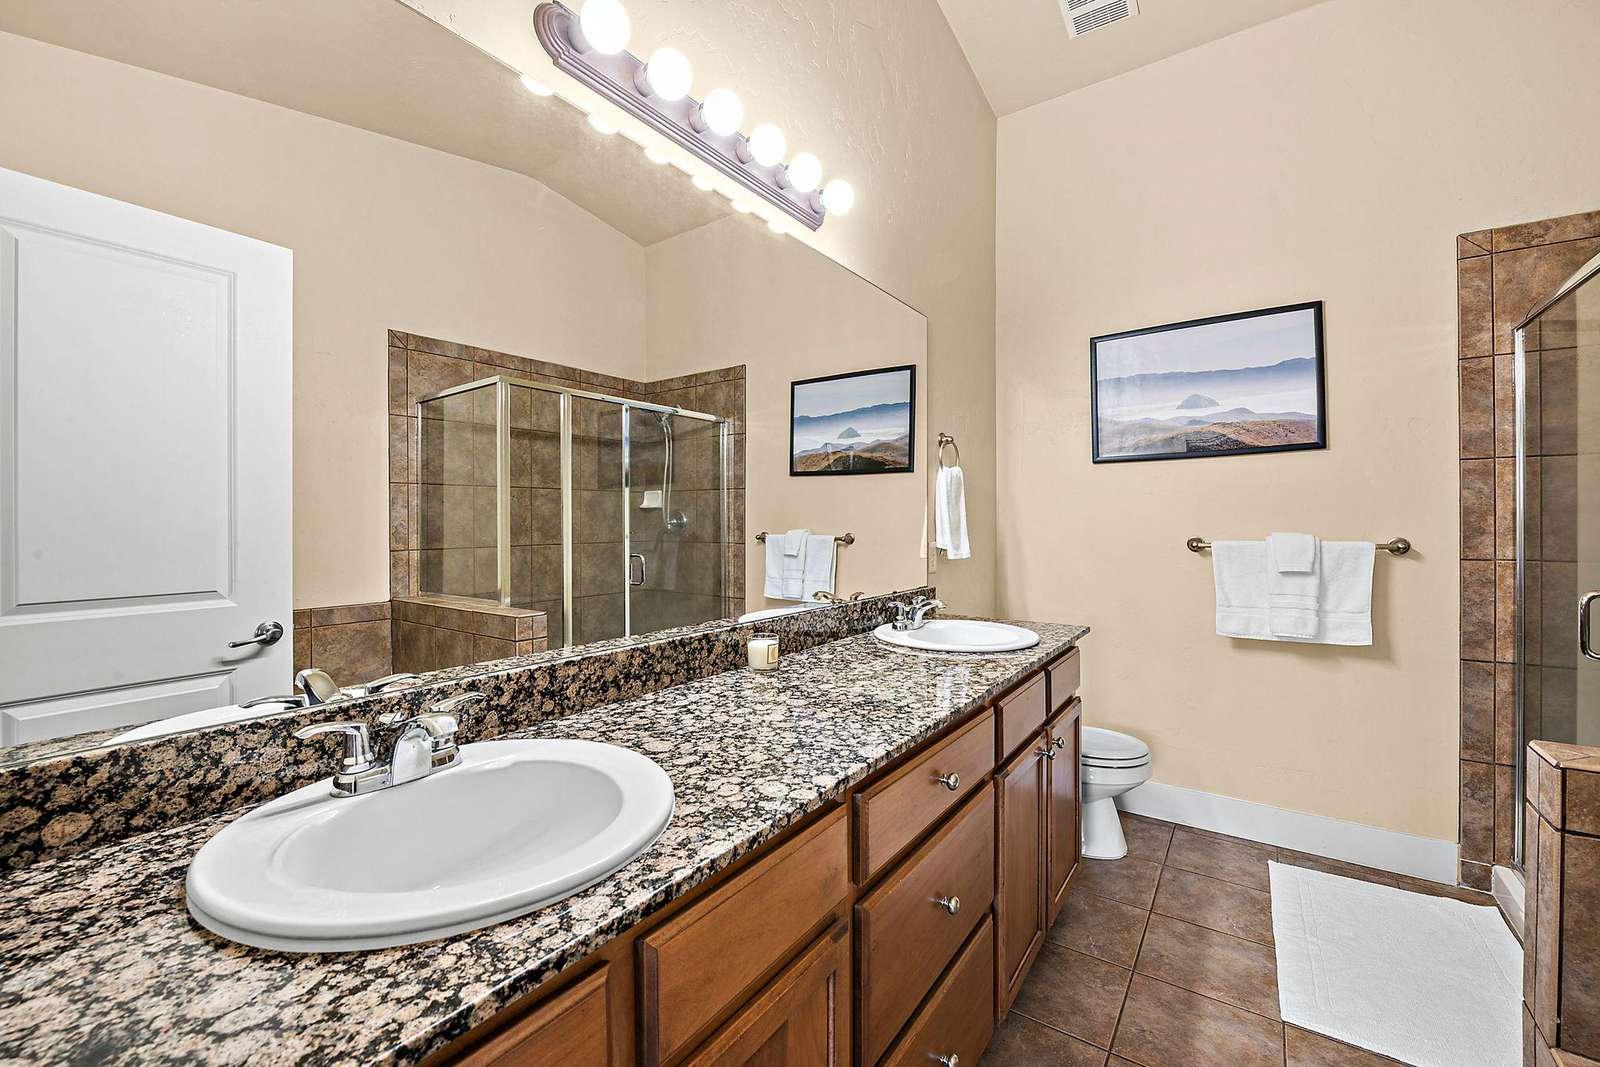 Master en-suite bathroom with two sinks